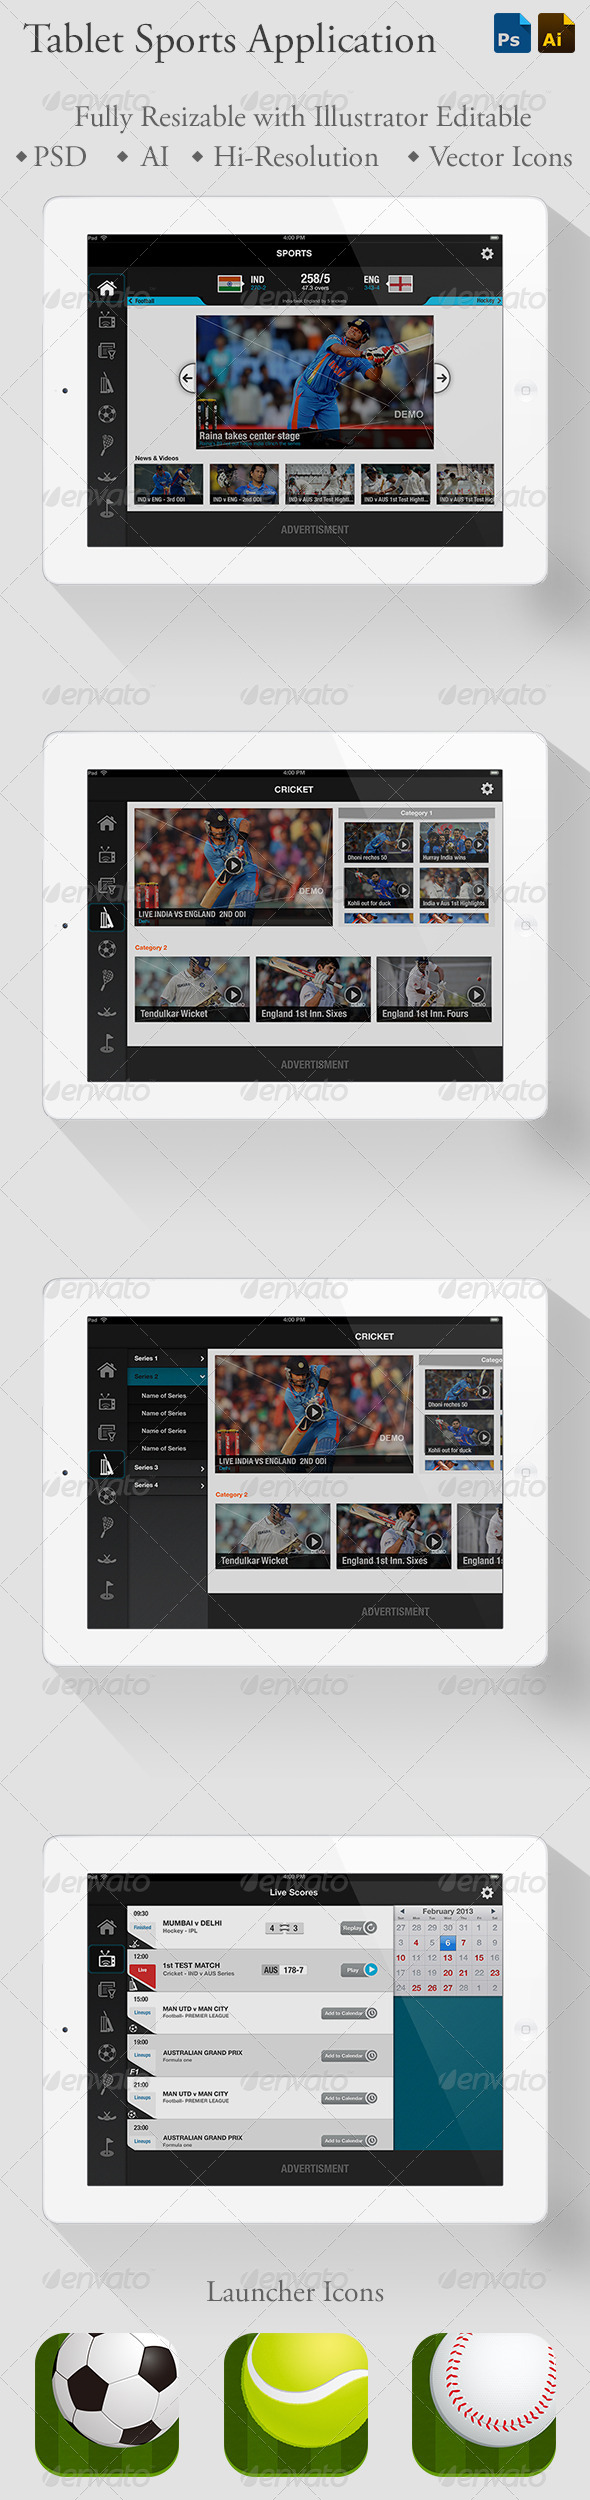 Sports Application iPad Tablet